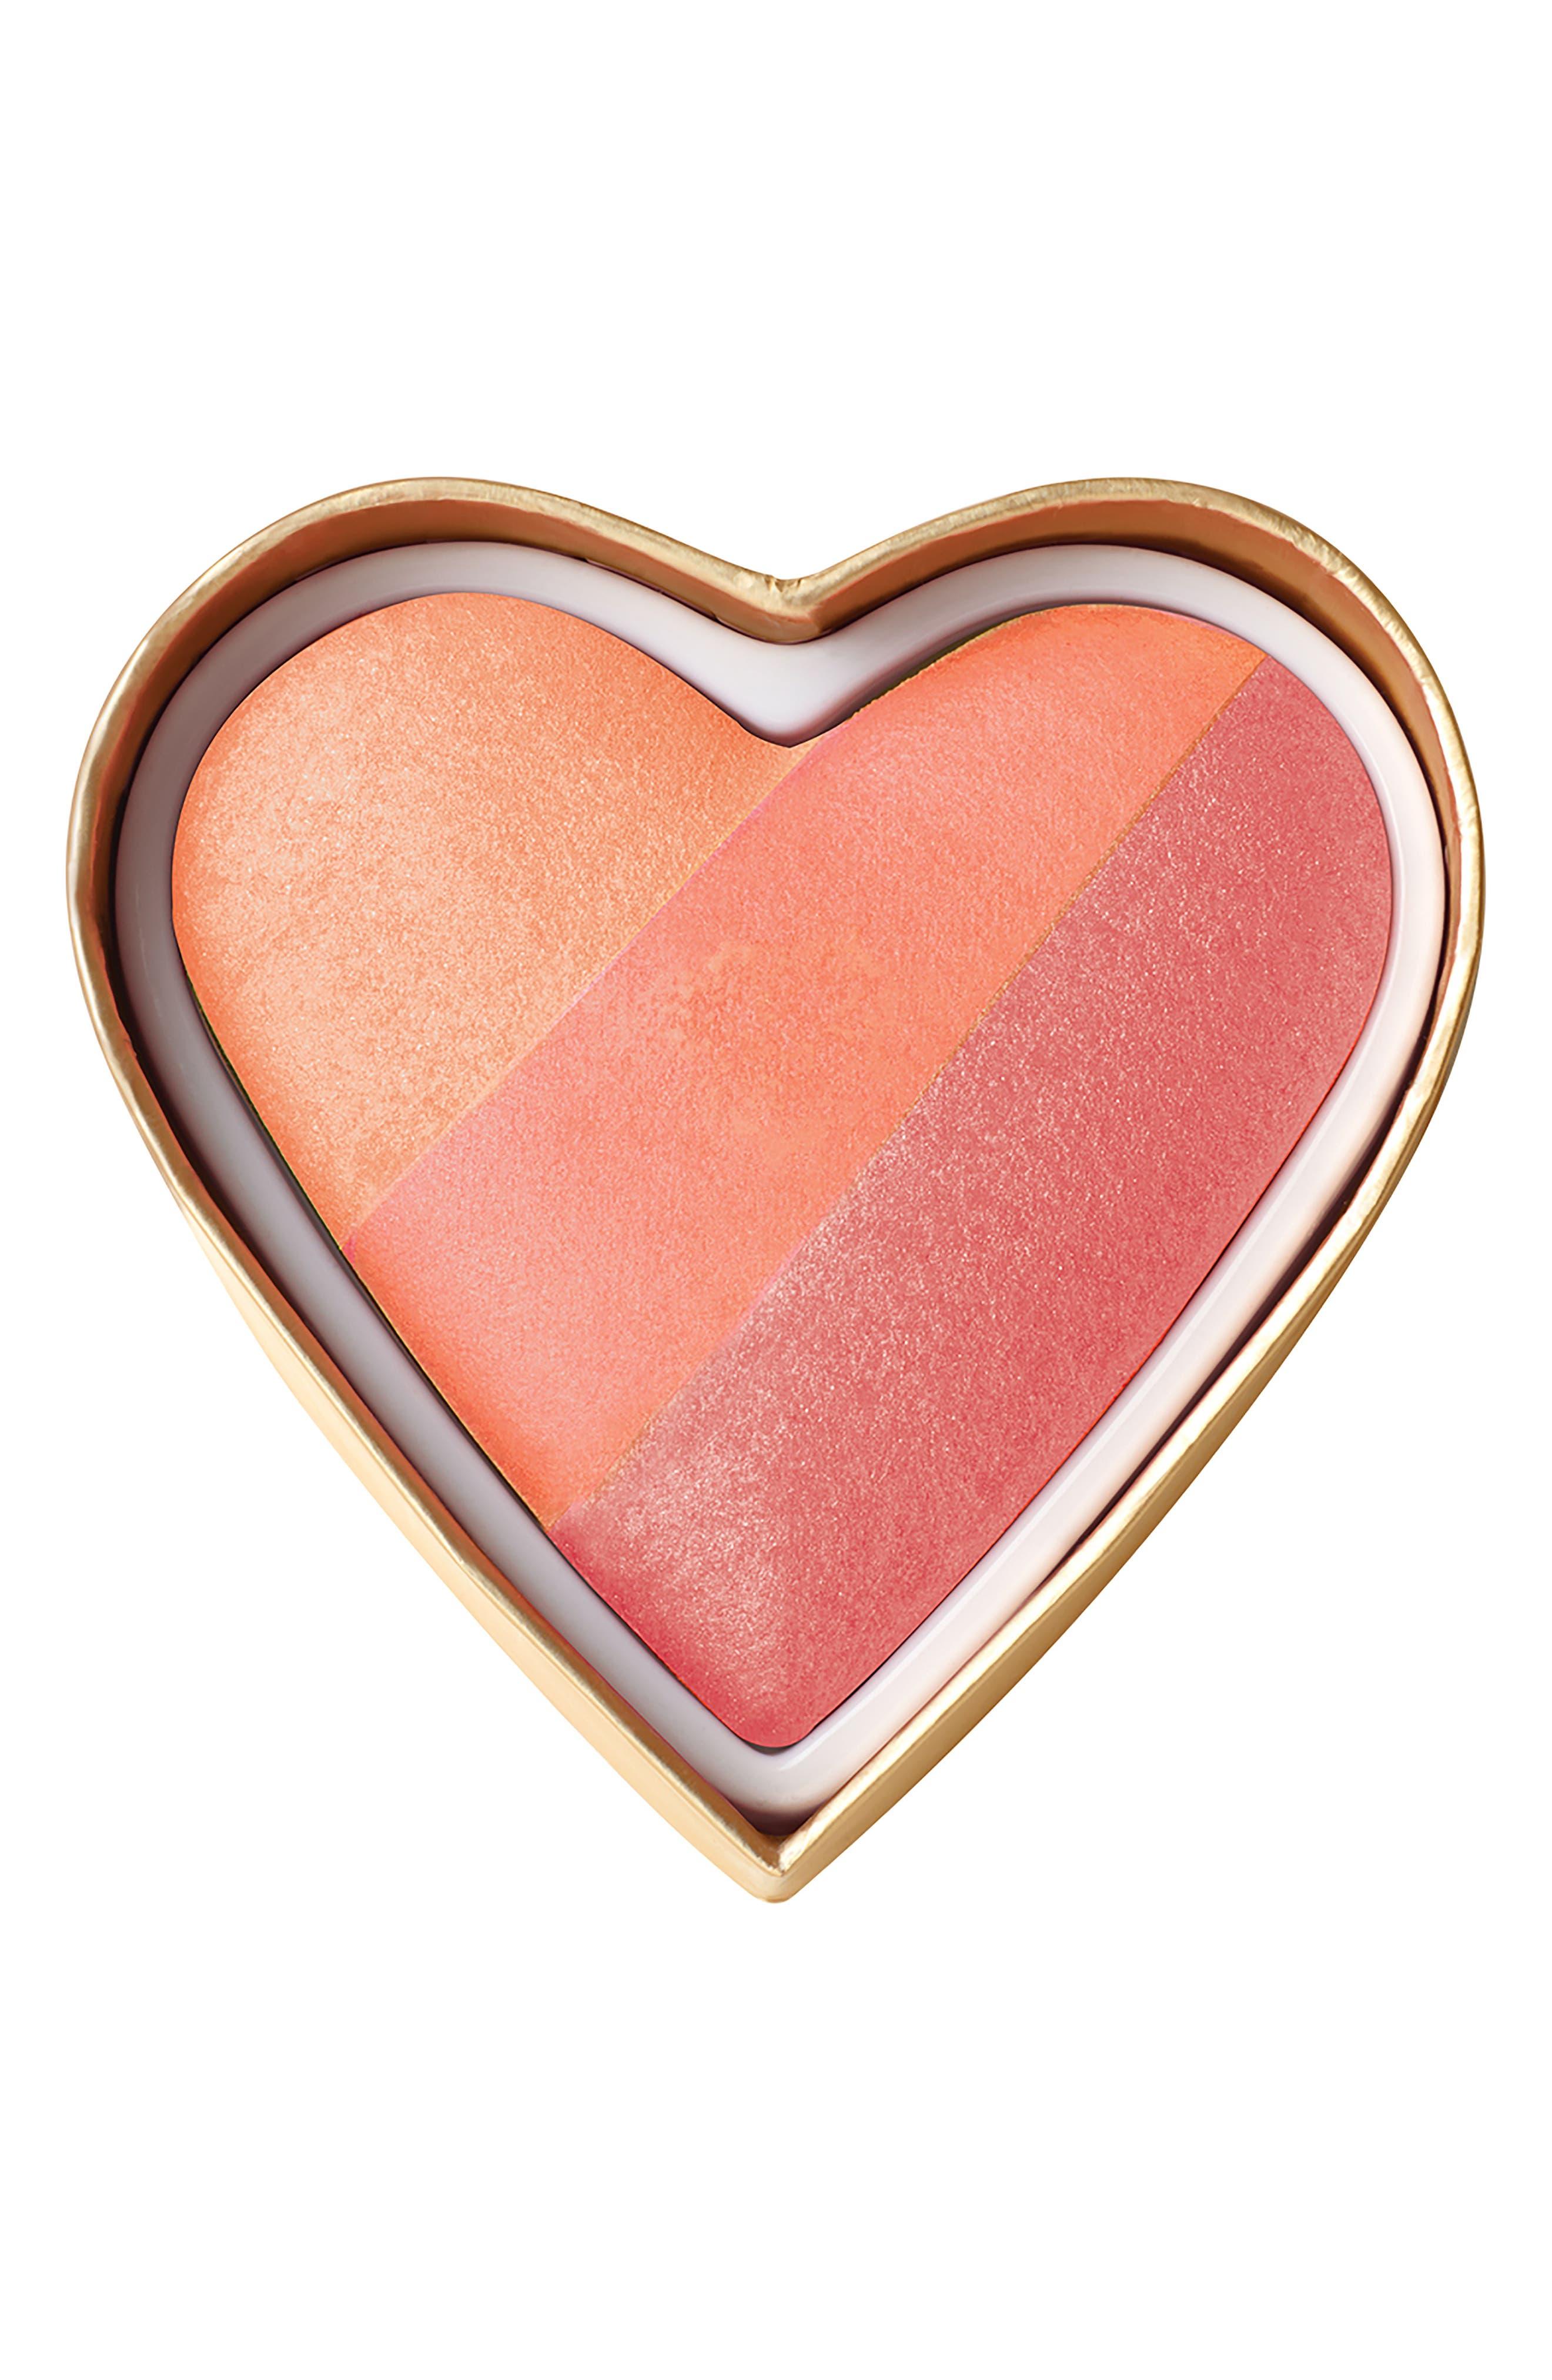 Sweethearts Perfect Flush Blush,                             Alternate thumbnail 3, color,                             Sparkling Bellini